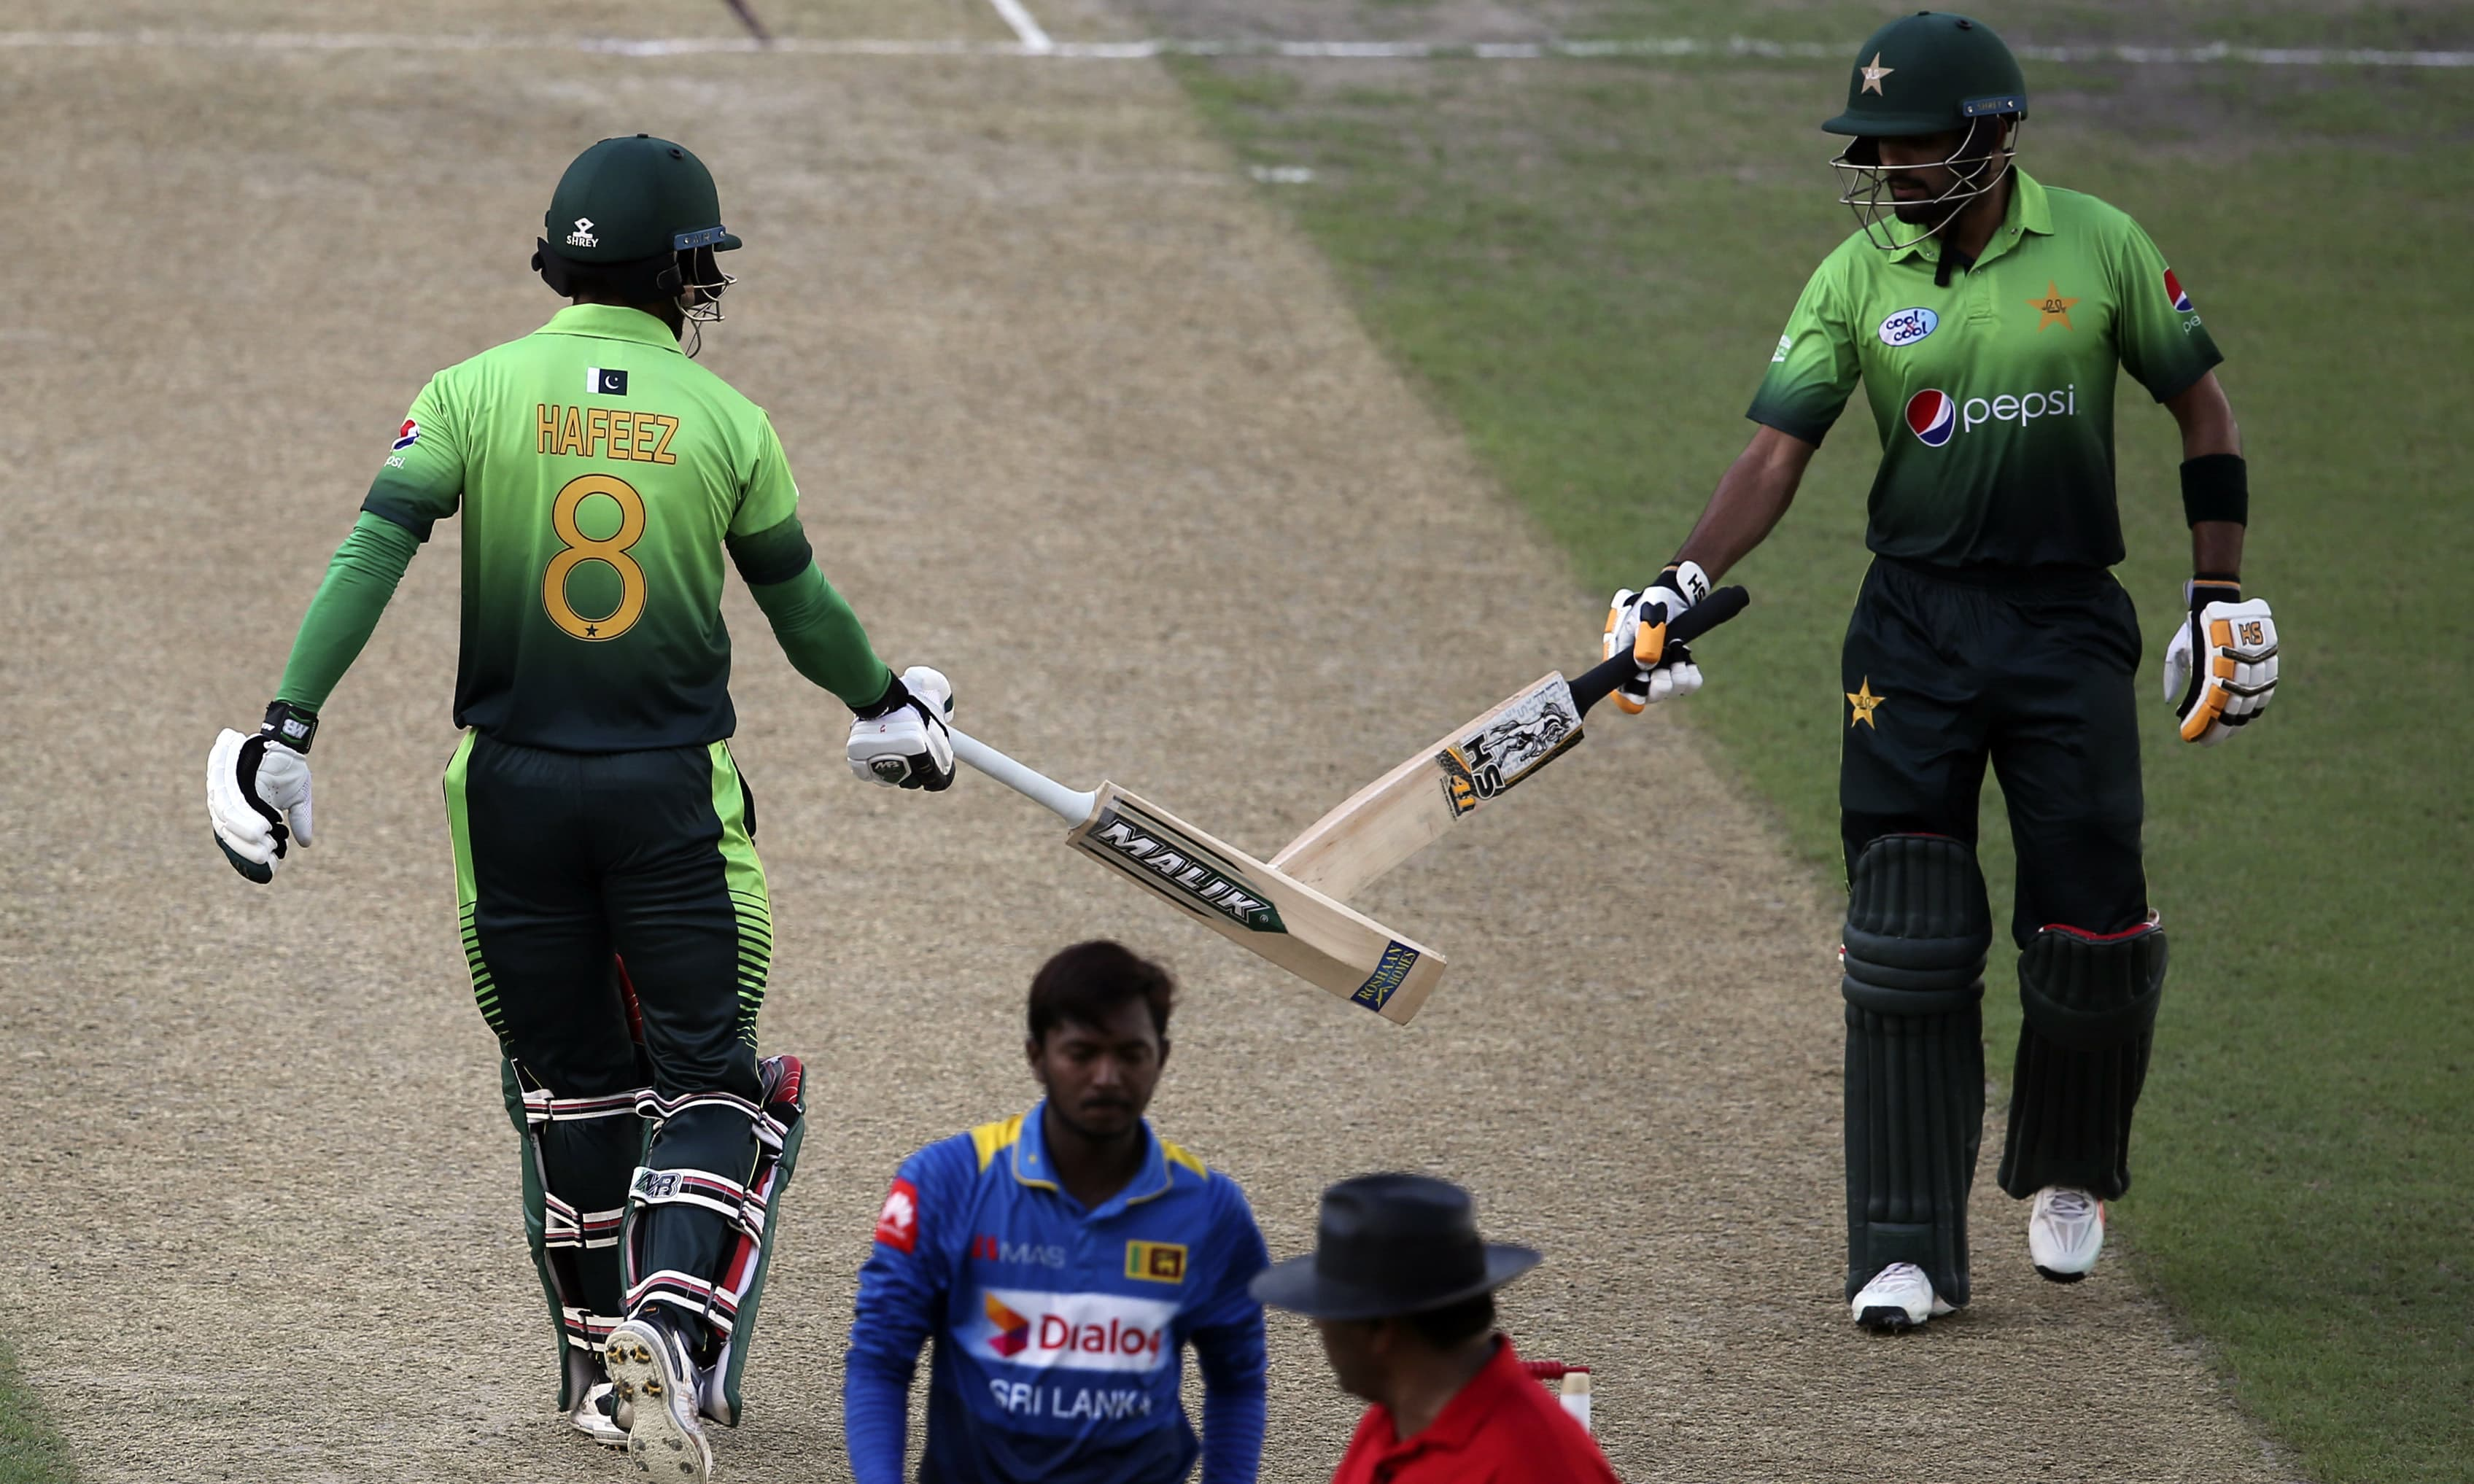 Mohammad Hafeez and Babar Azam touch their their bats during their first ODI cricket match against Sri Lanka in Dubai. —AP